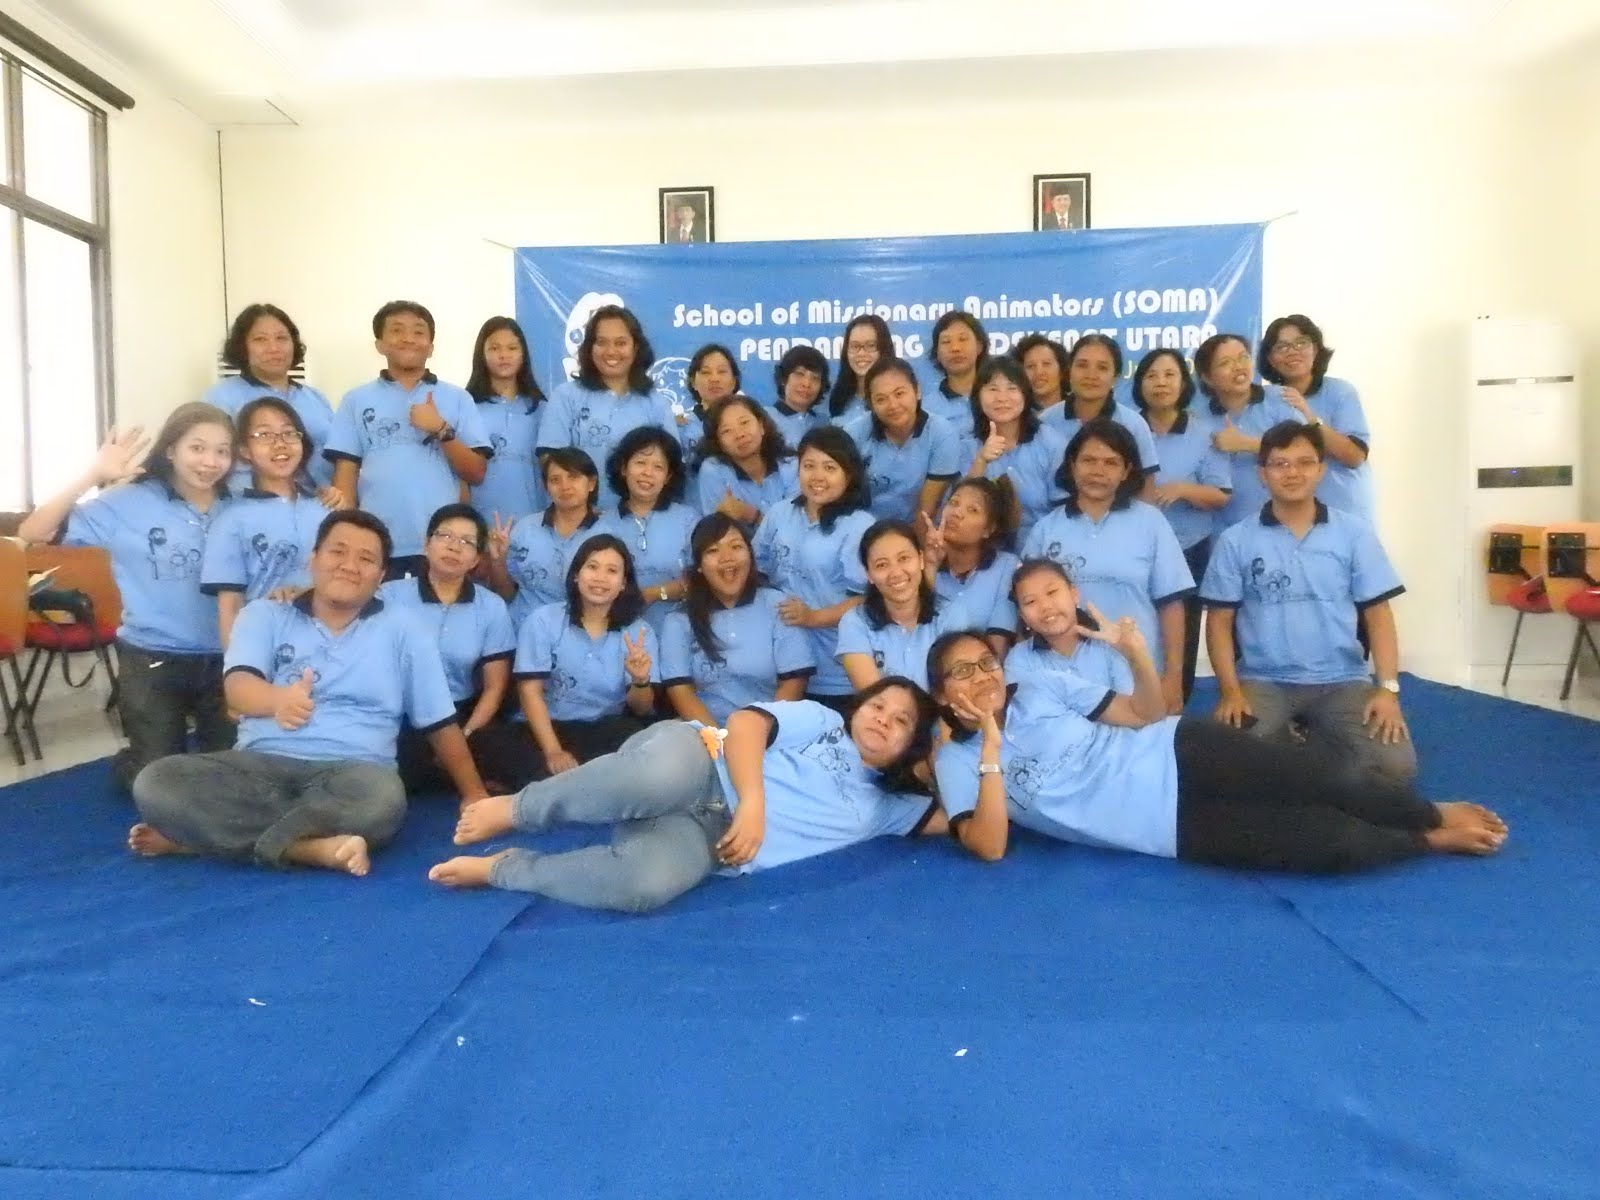 Bersama Para Pendamping PIA dekenat utara Keuskupan Purwokerto 16-17 Juli 2016